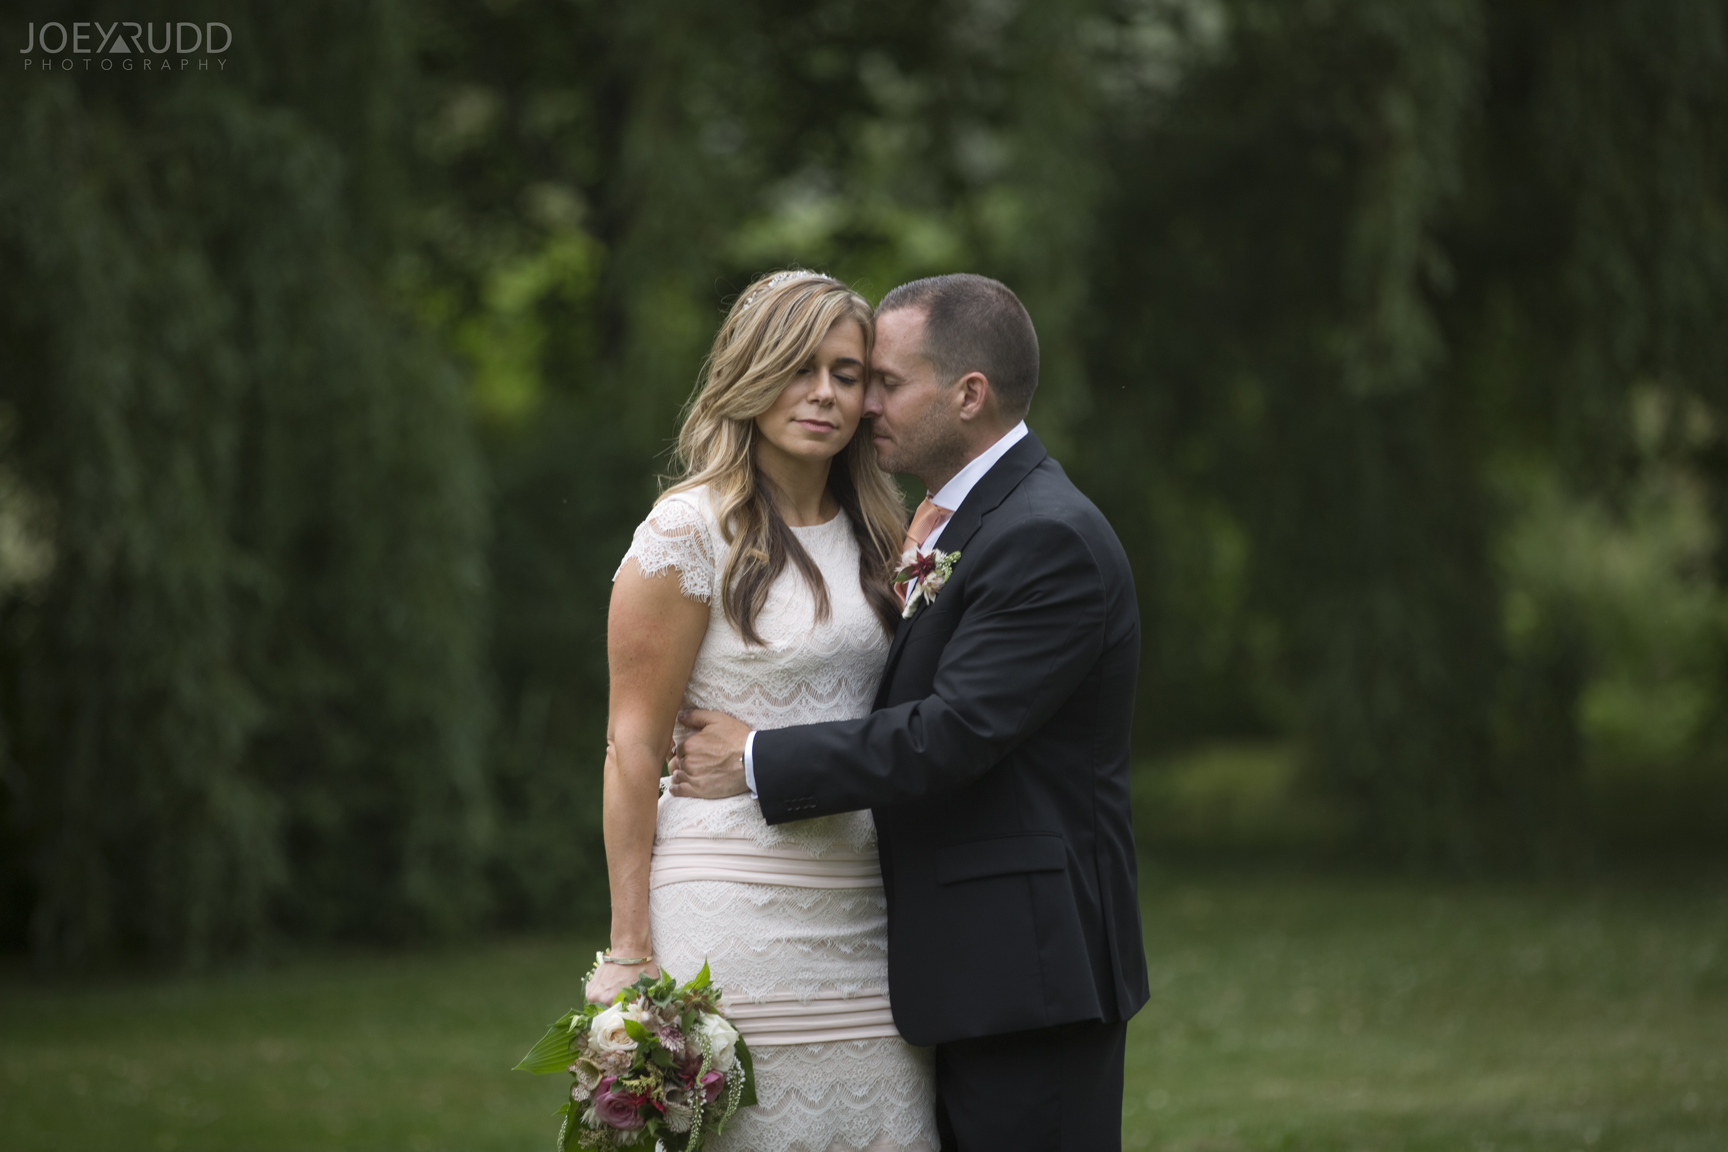 Elopement Wedding by Ottawa Wedding Photographer Joey Rudd Photography Arboretum Nature Willow Love